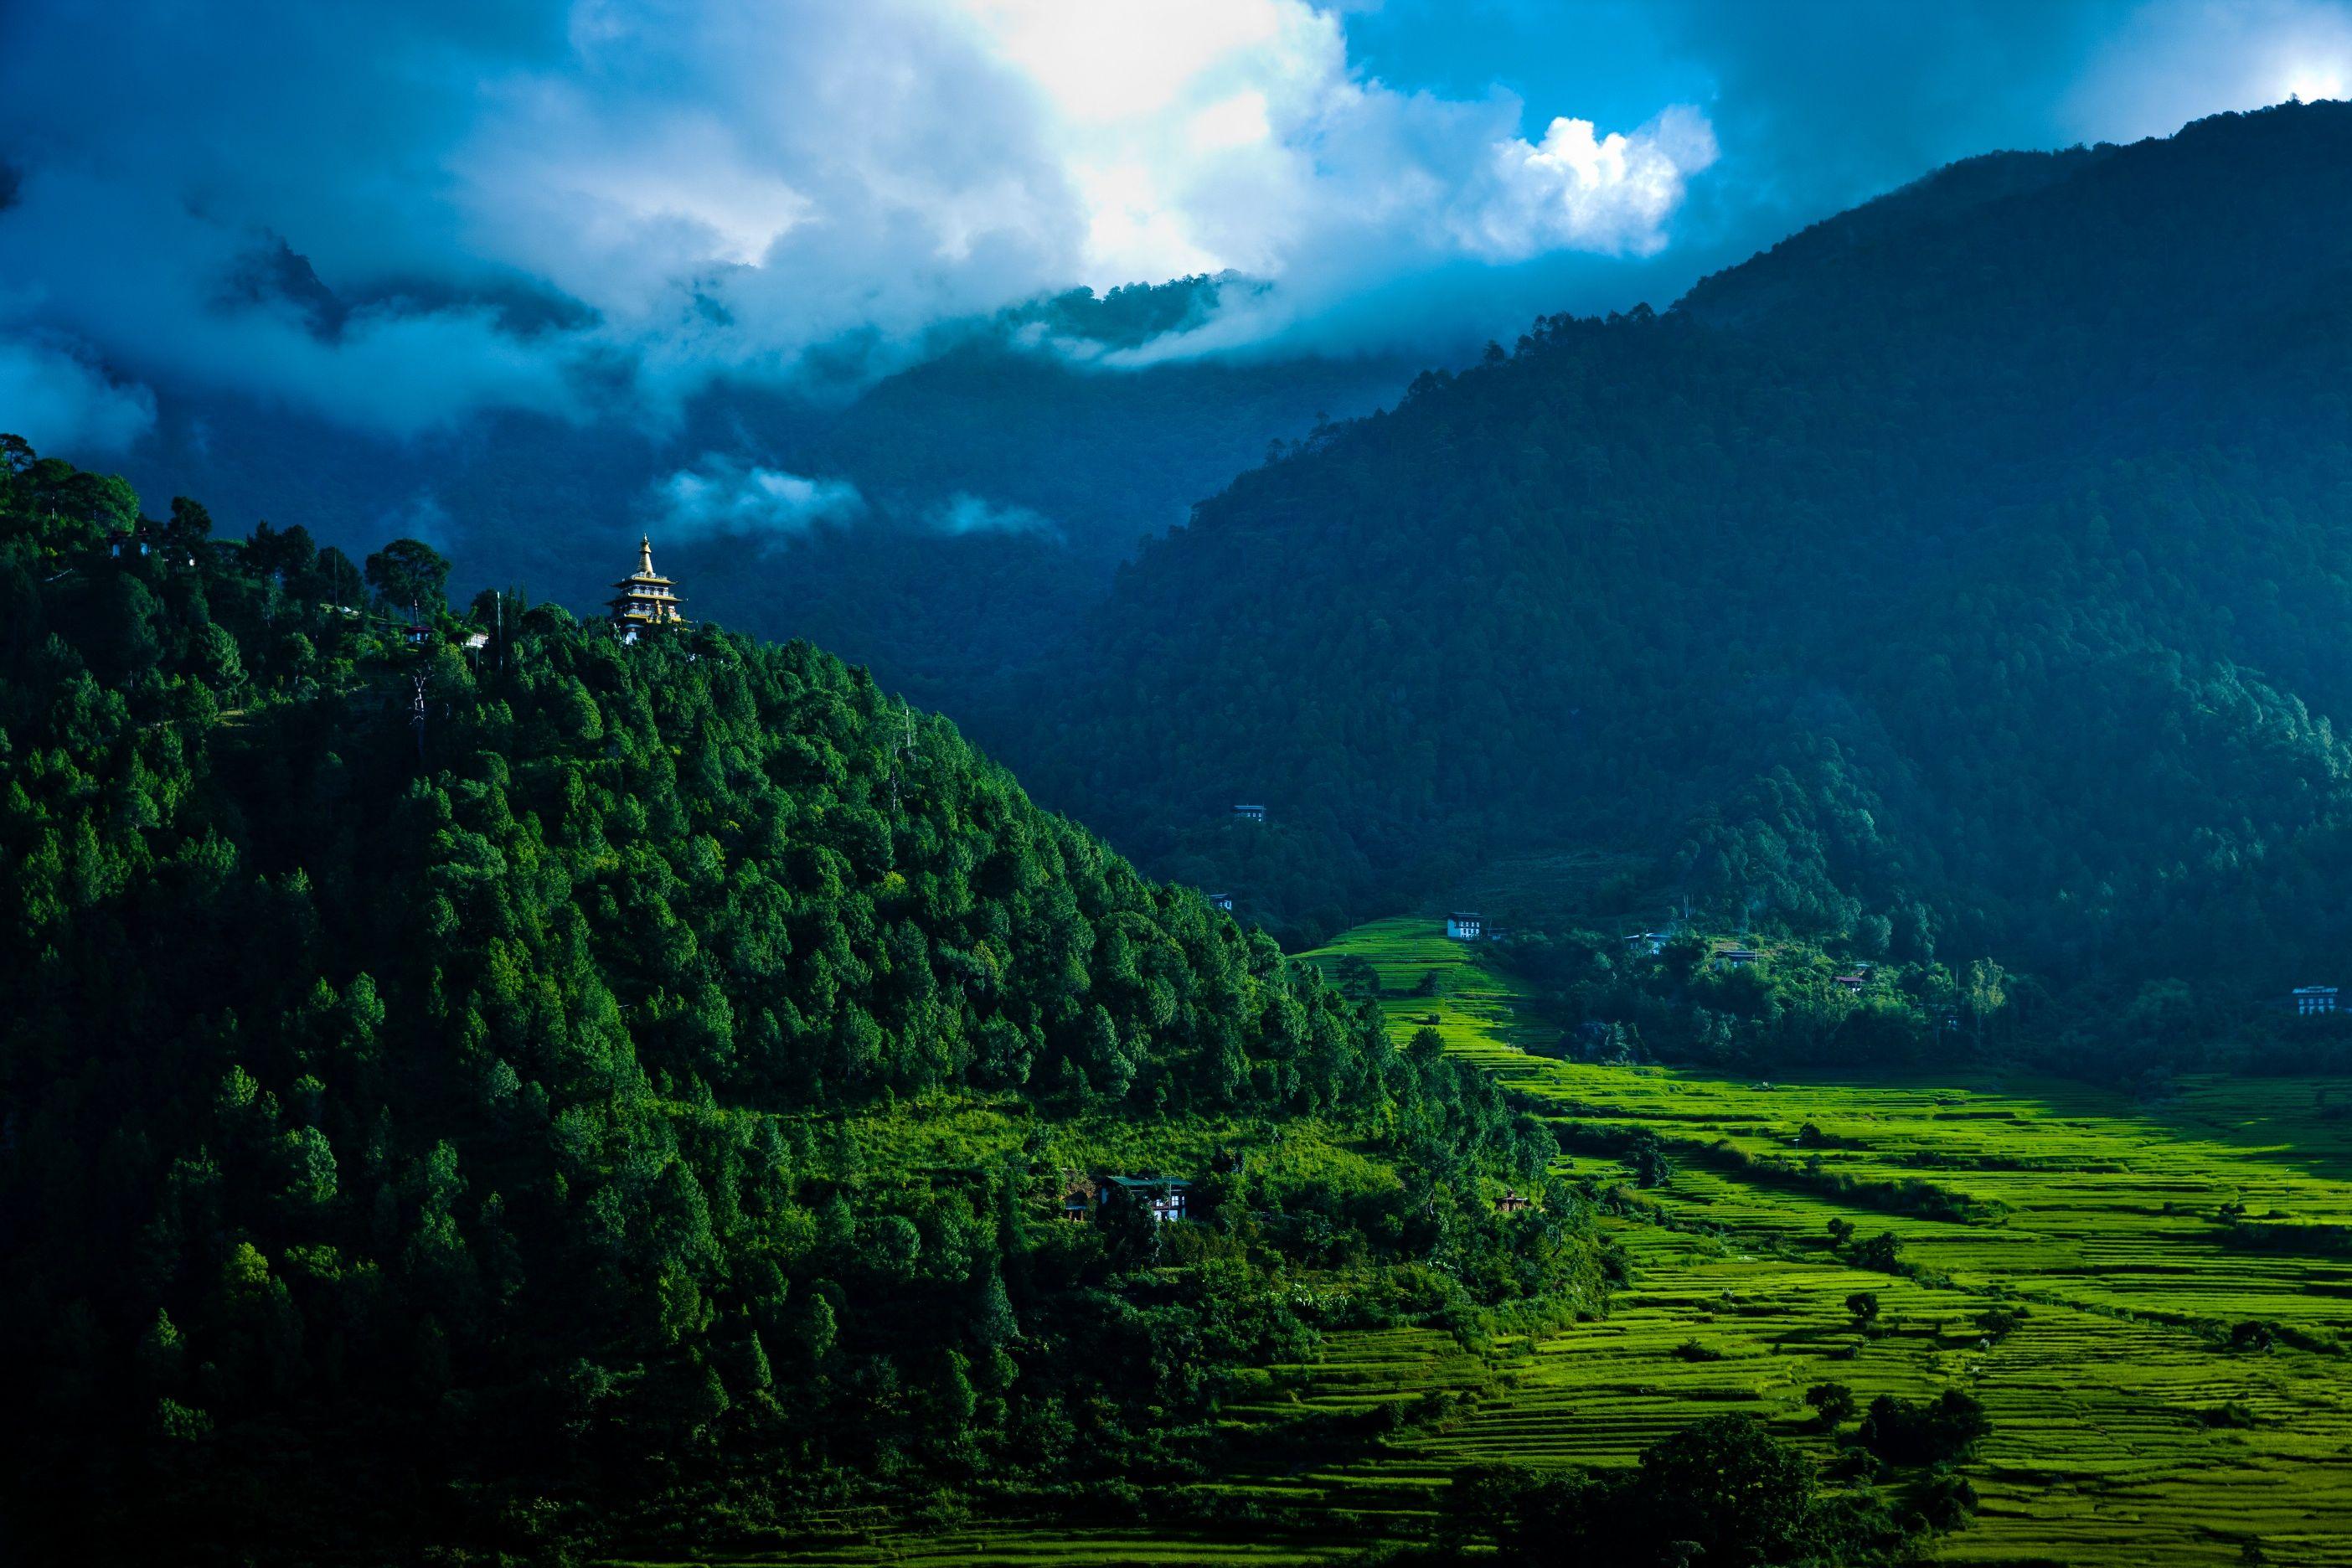 Valley view, Uma Punakha, Bhutan.